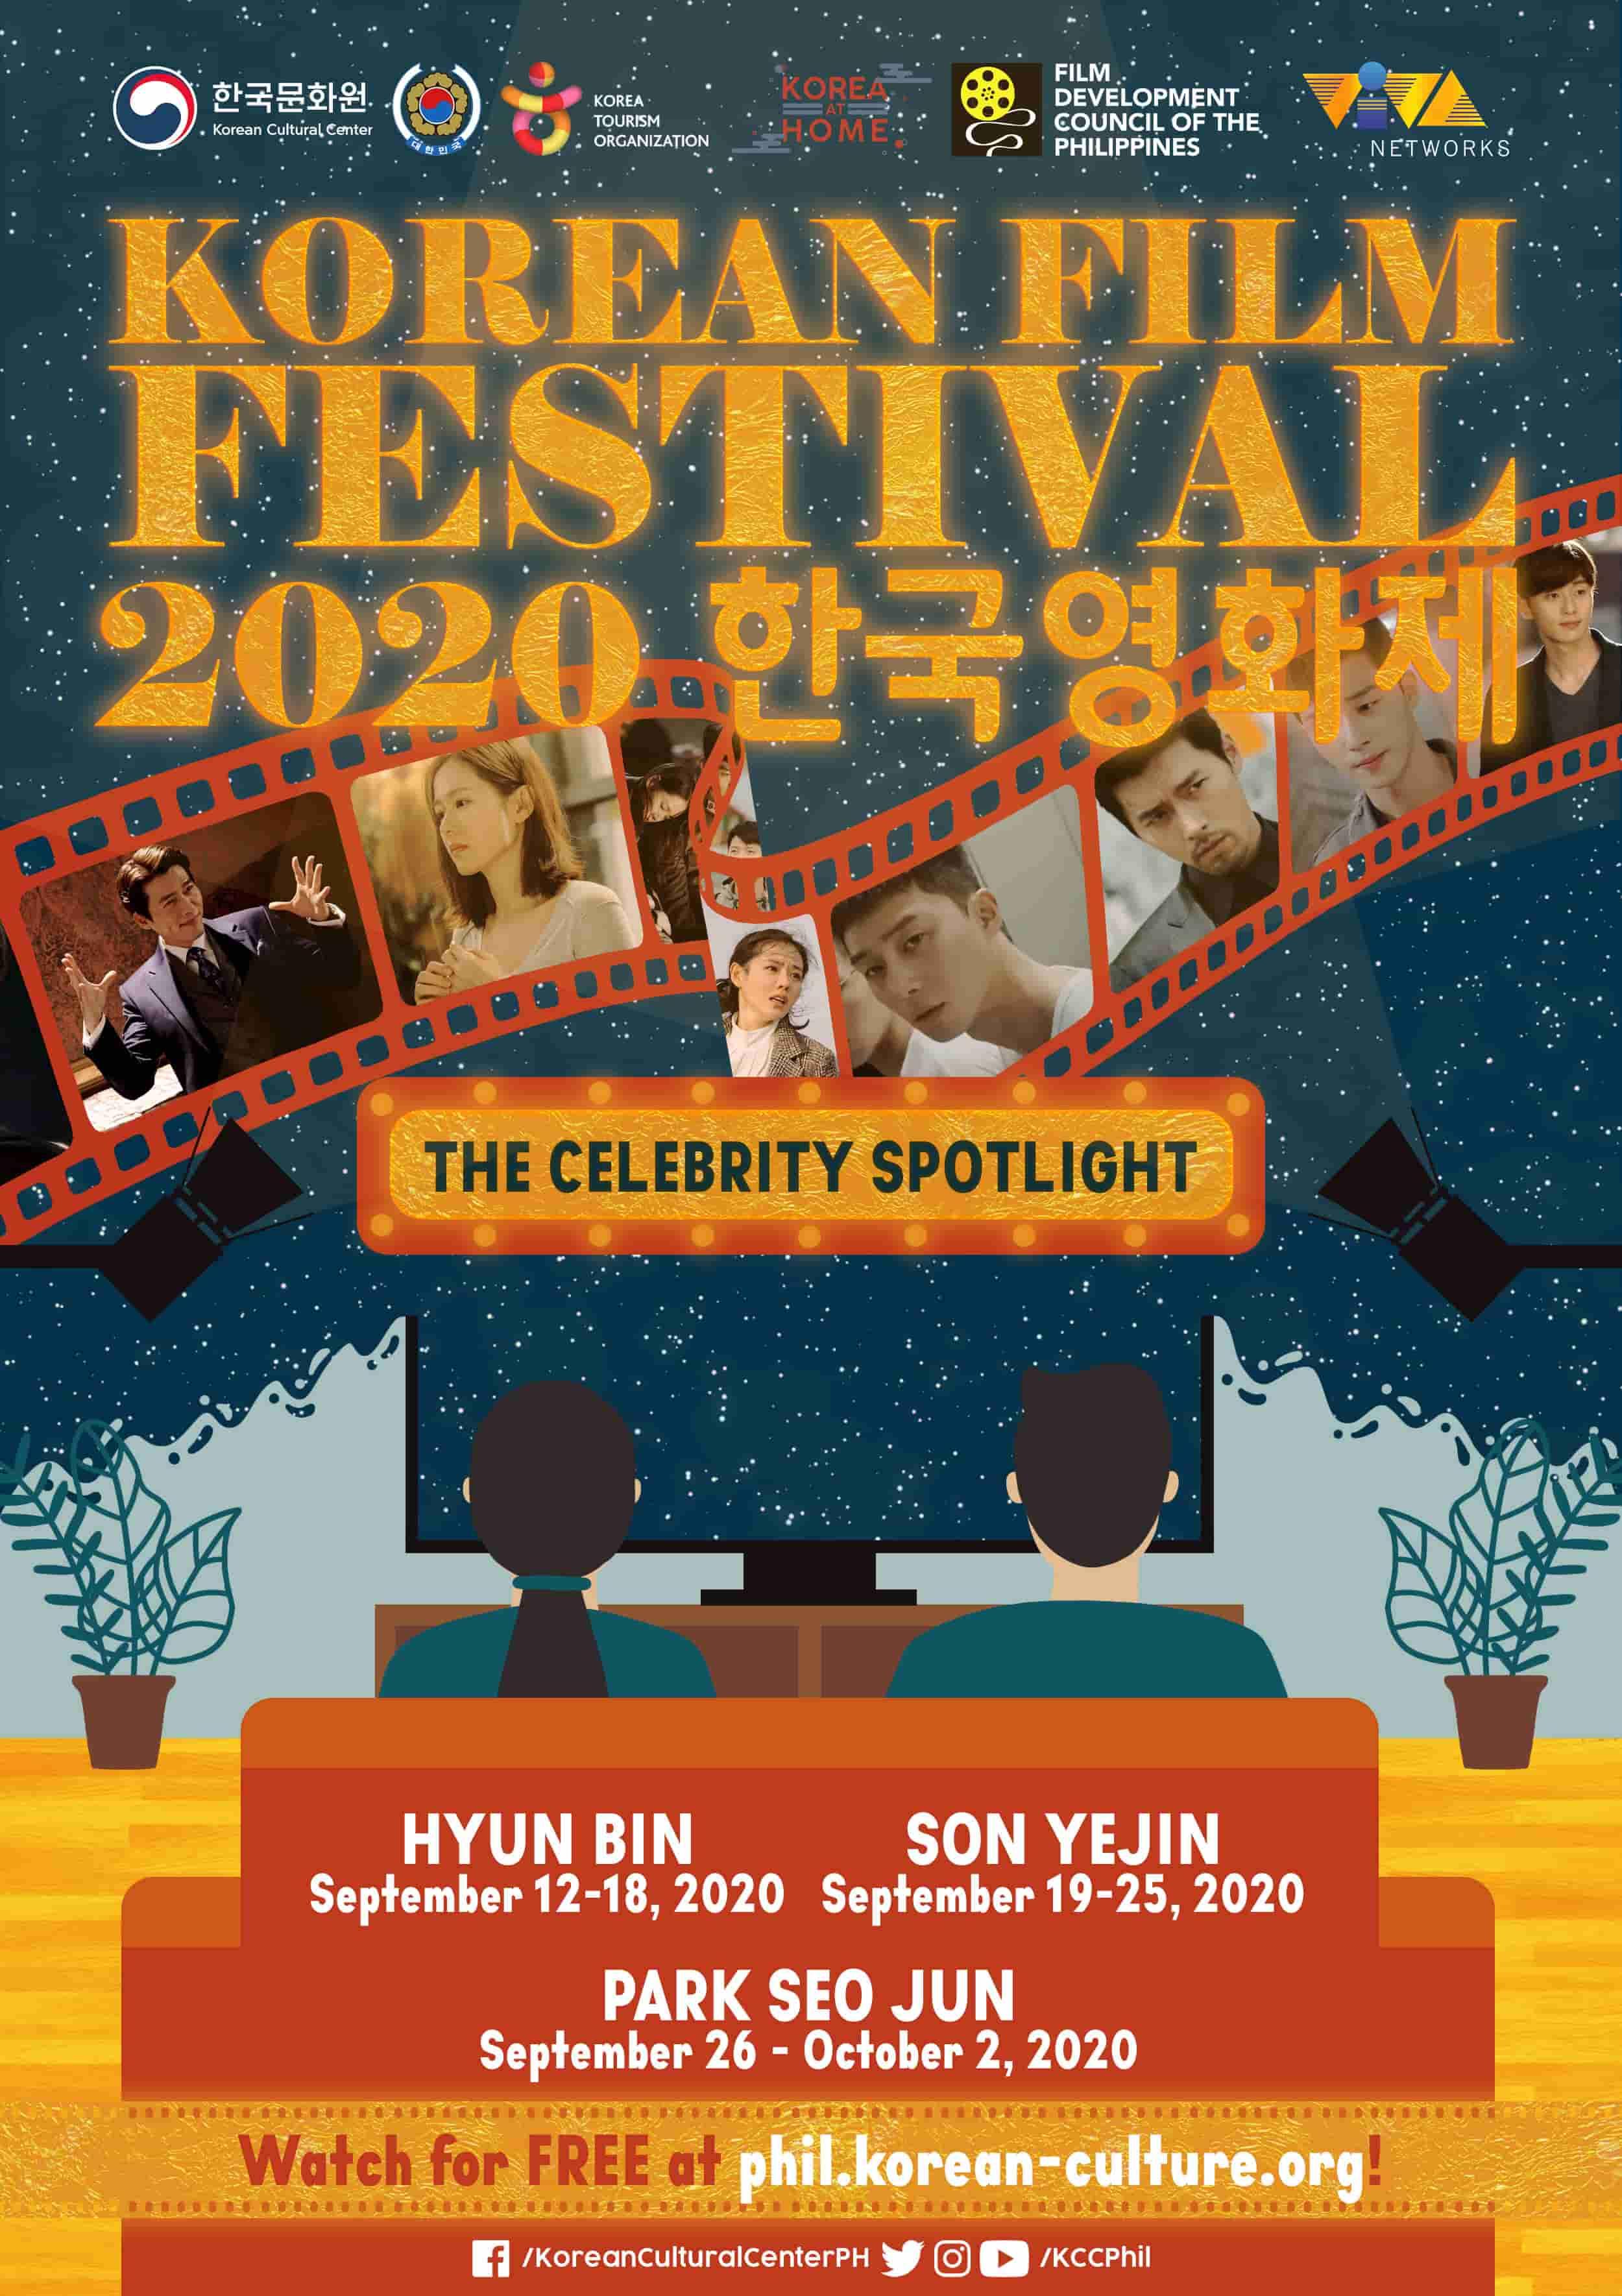 Korean Film Festival 2020 main poster featuring Park Seo Joon, Hyun Bin and Son Ye Jin movies